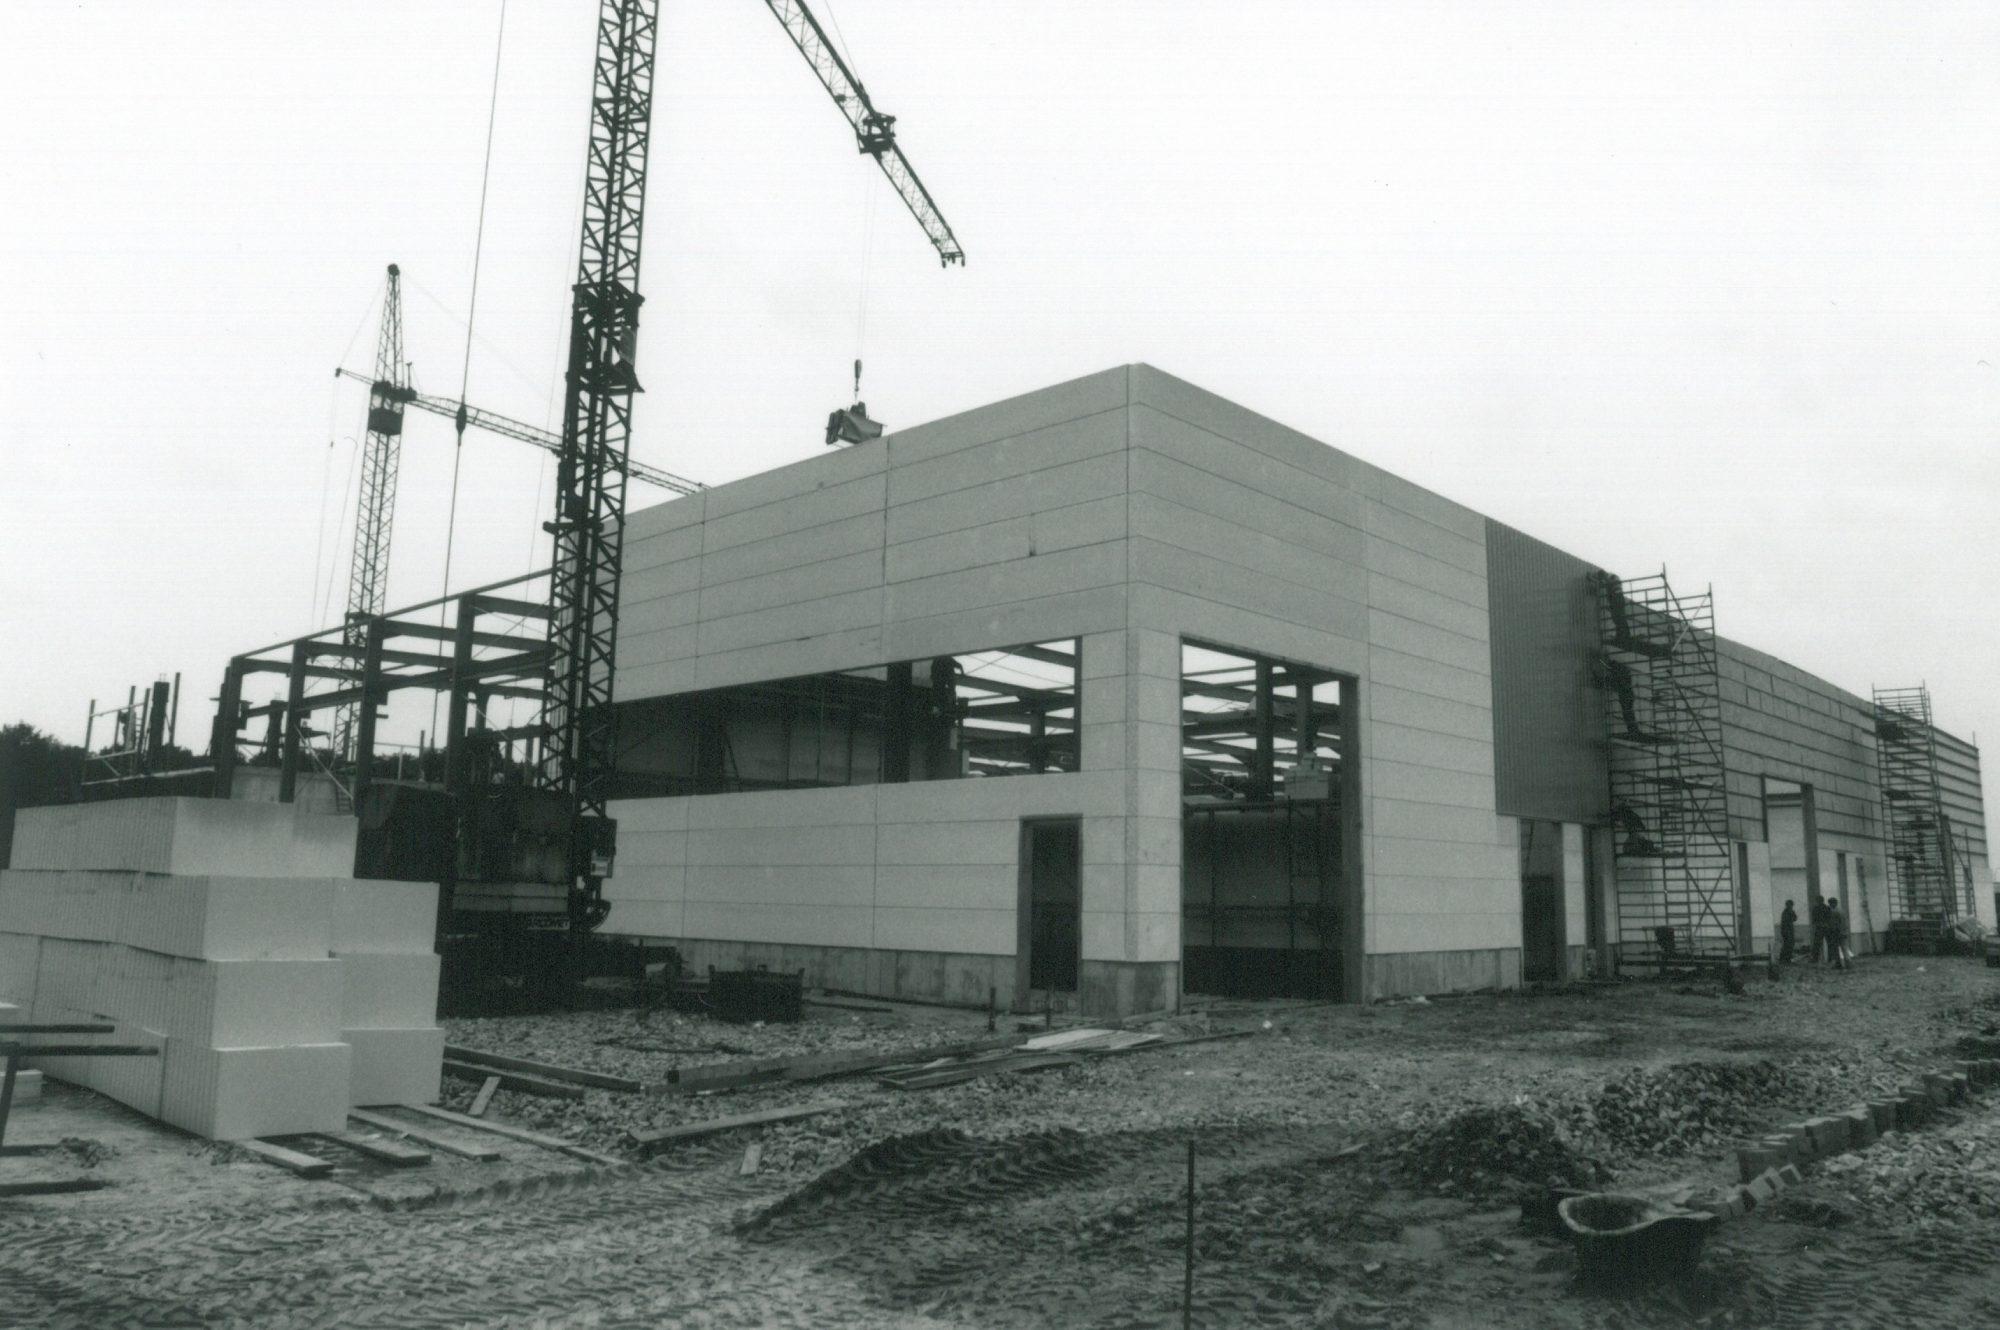 Neubau GIP-Halle